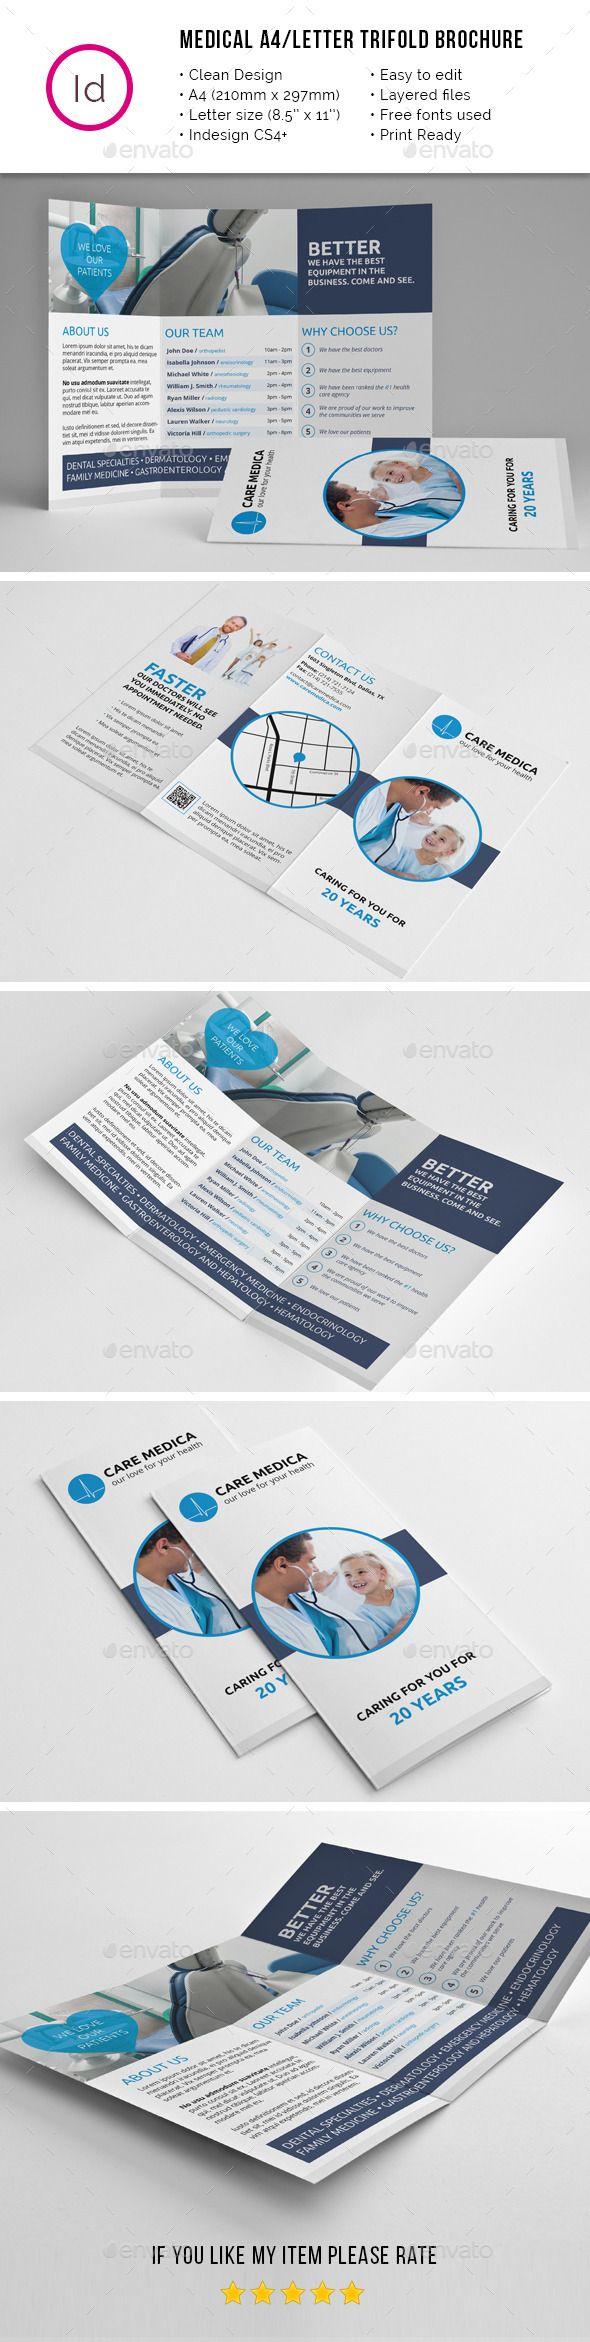 Medical A4 Letter Trifold Brochure Tempalte